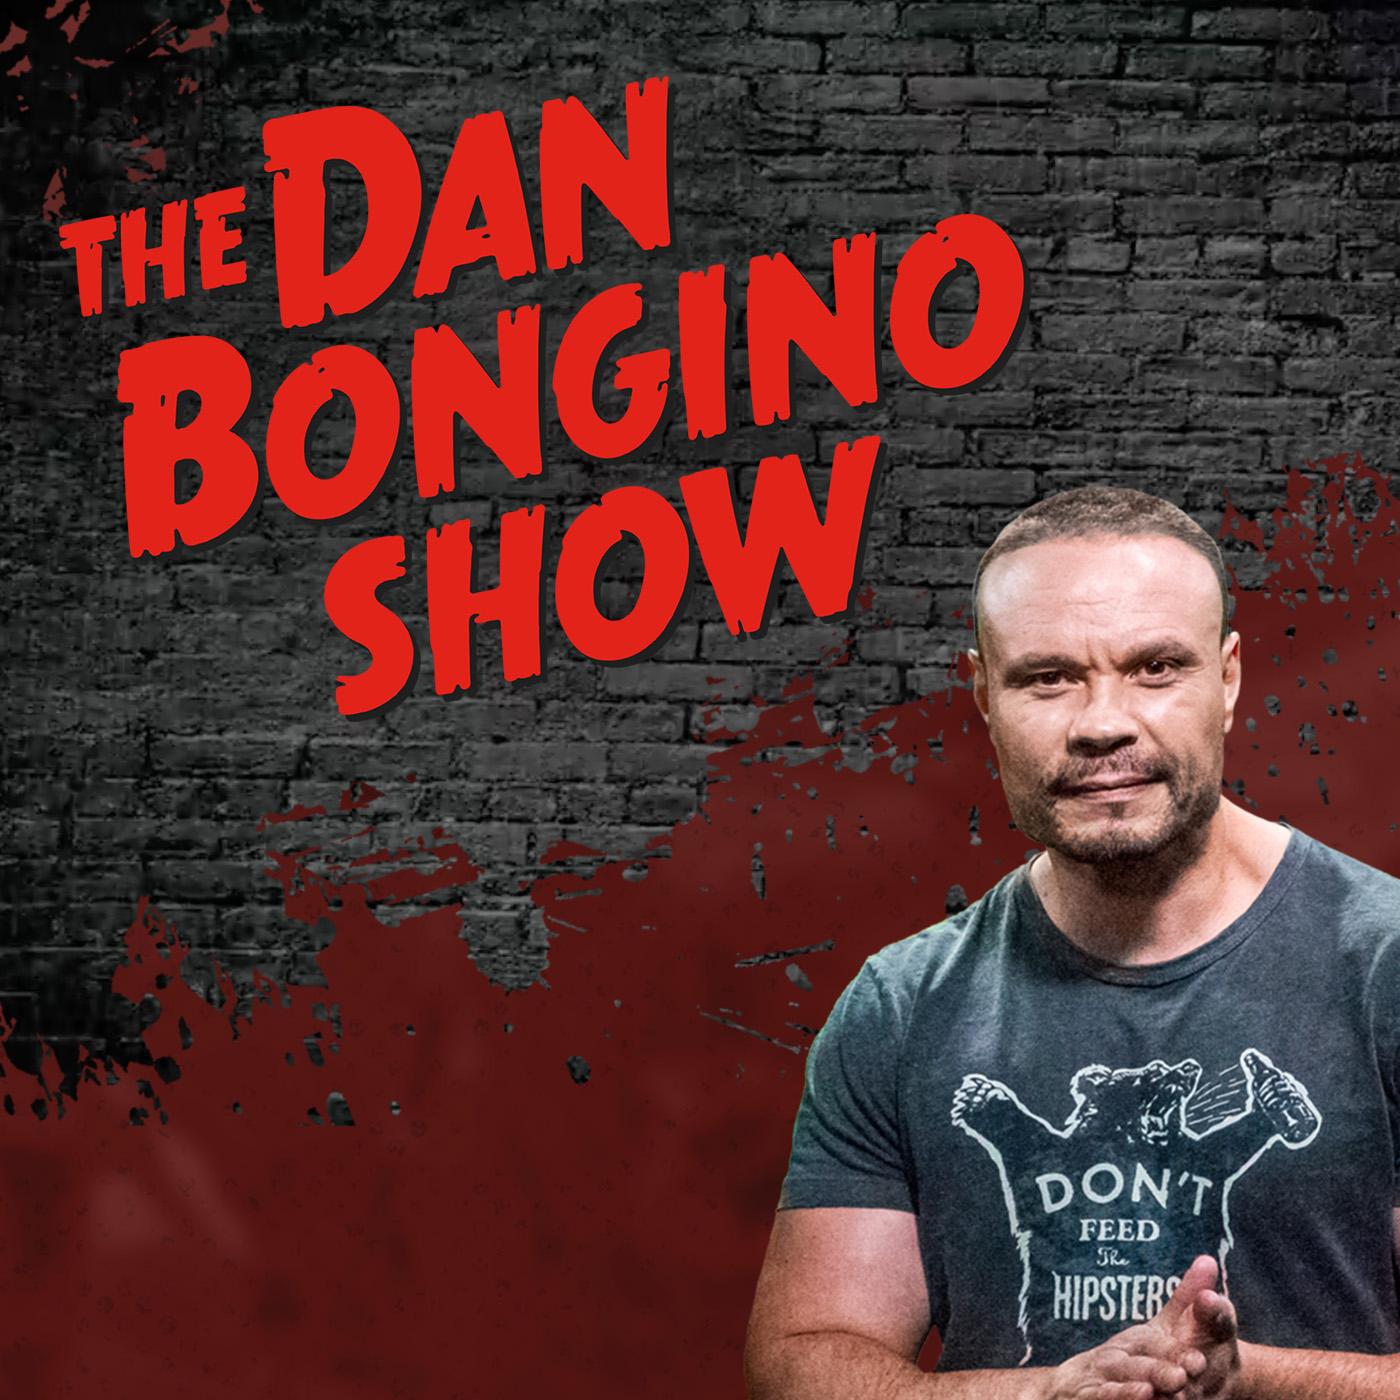 The Dan Bongino Show show art